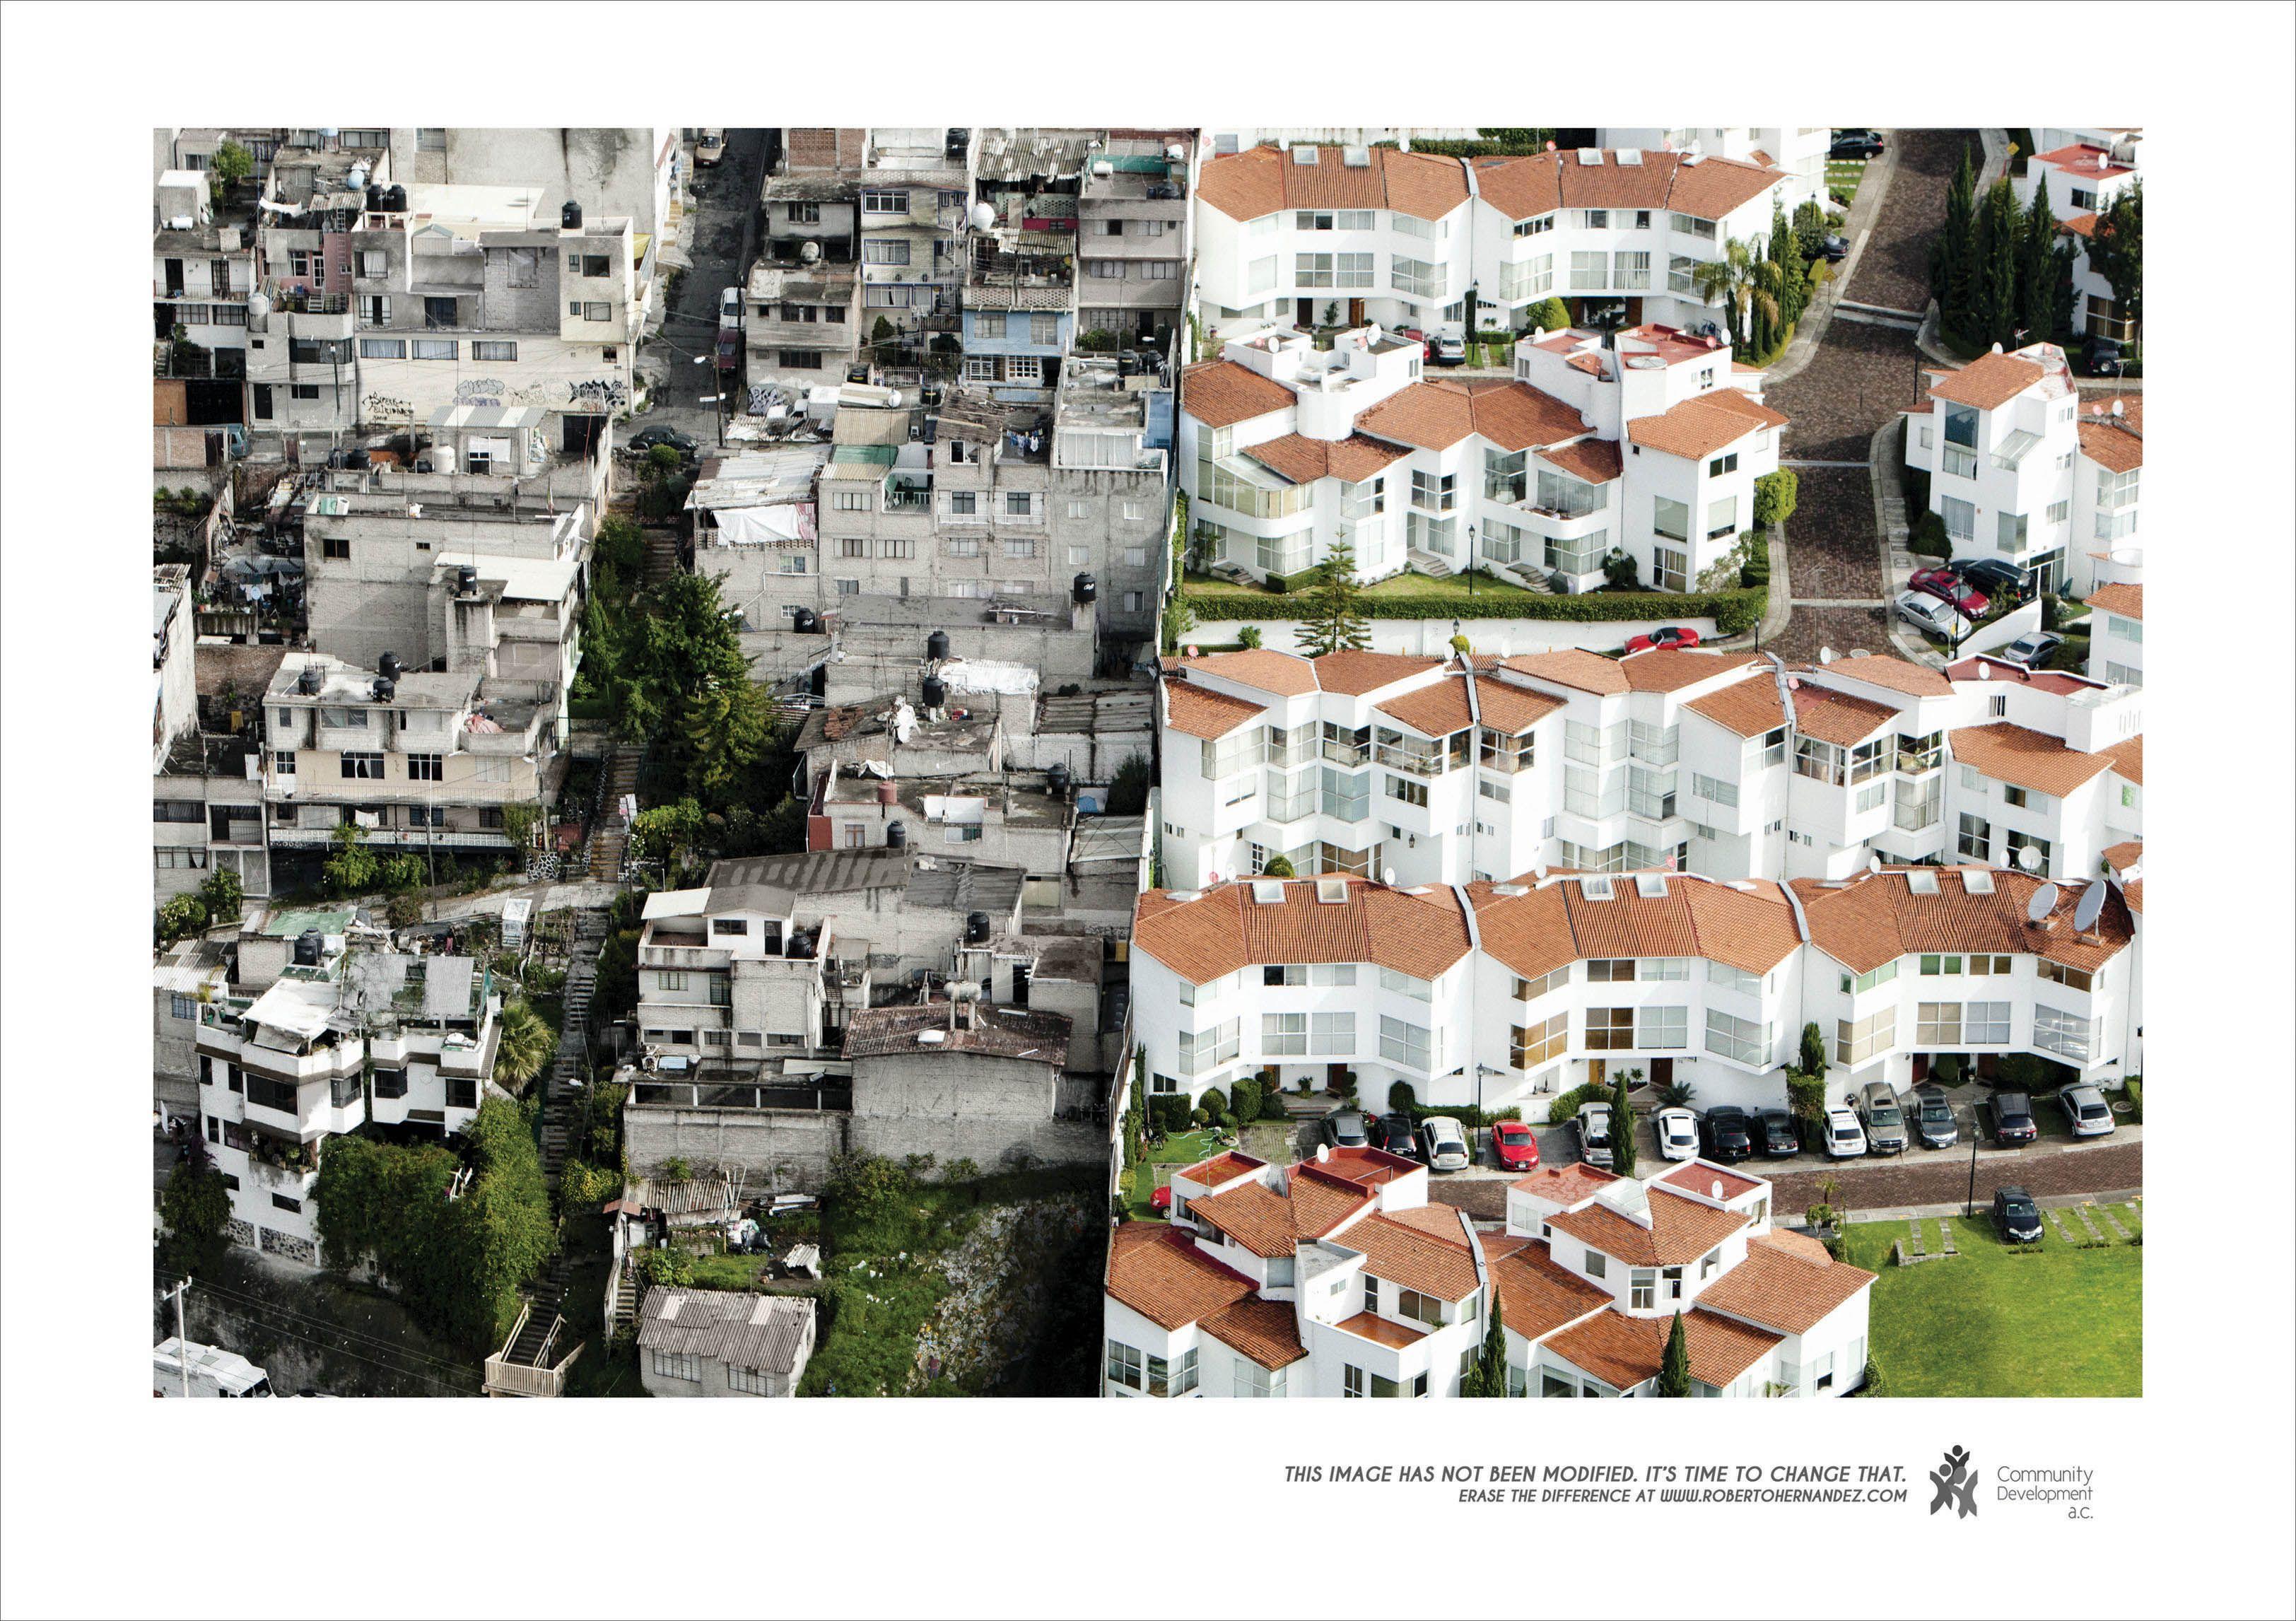 Adeevee Banamex Cdc Houses Gardens Buildings Development Mexico Slums City